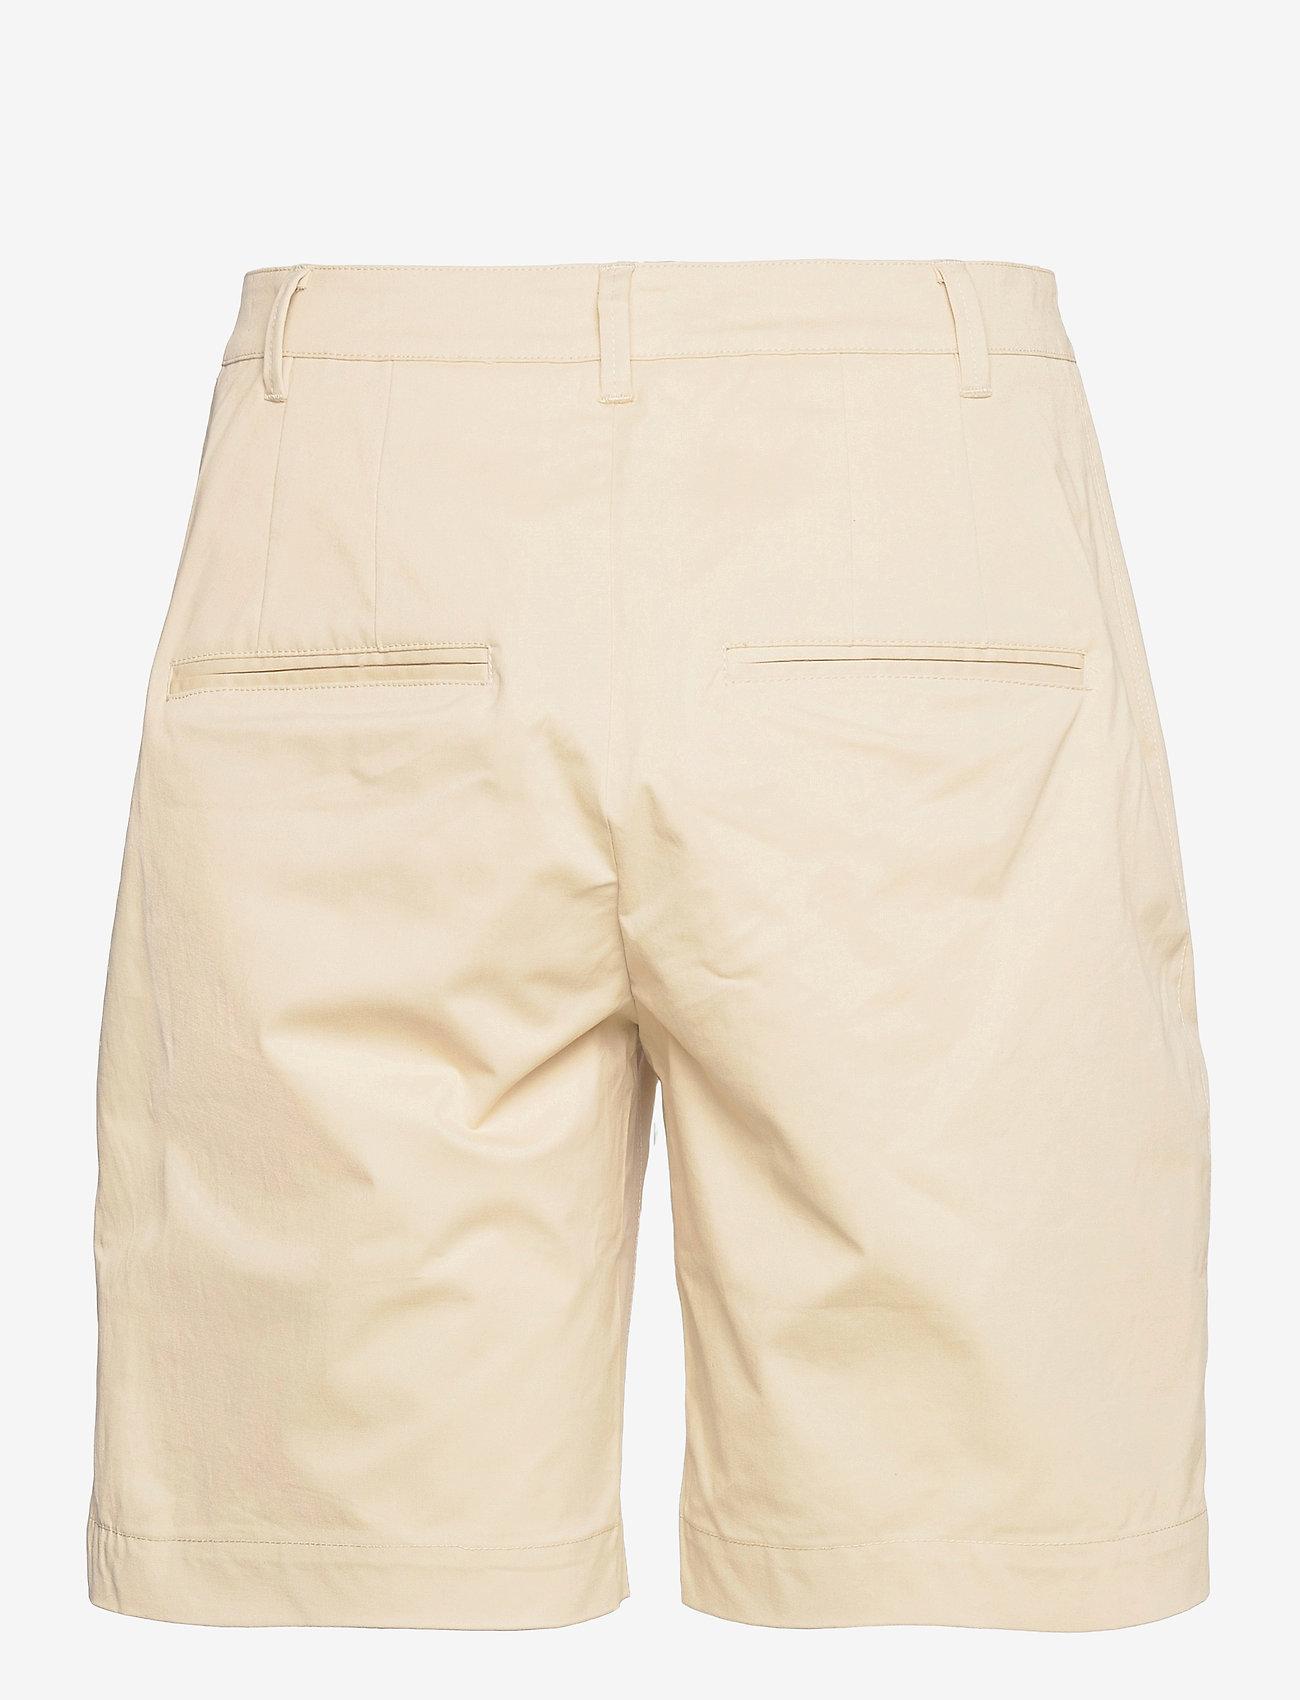 Noa Noa - Shorts - chino shorts - castle wall - 1